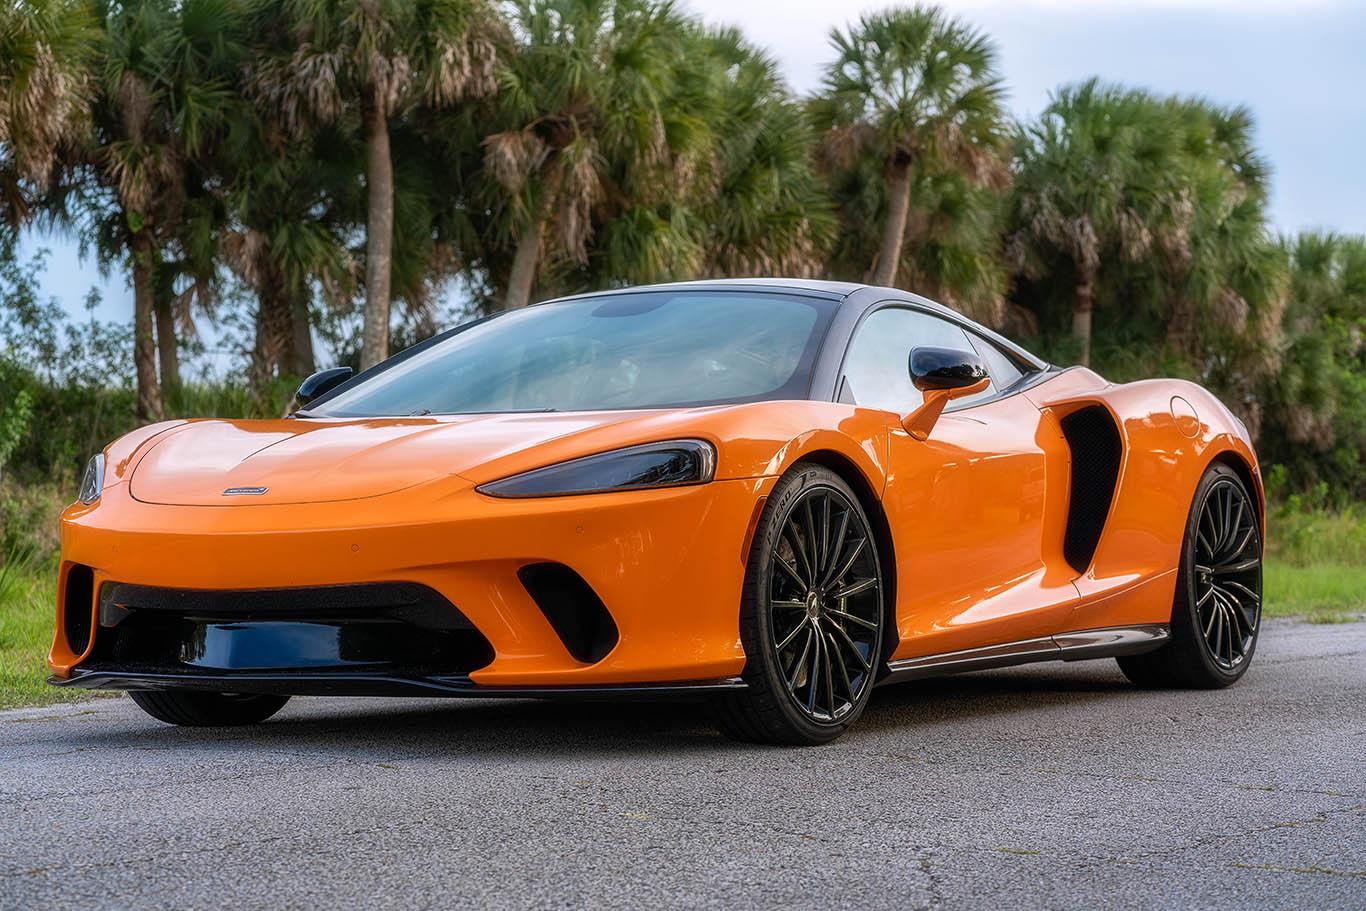 car show november 6 2021, space coast cars and coffee